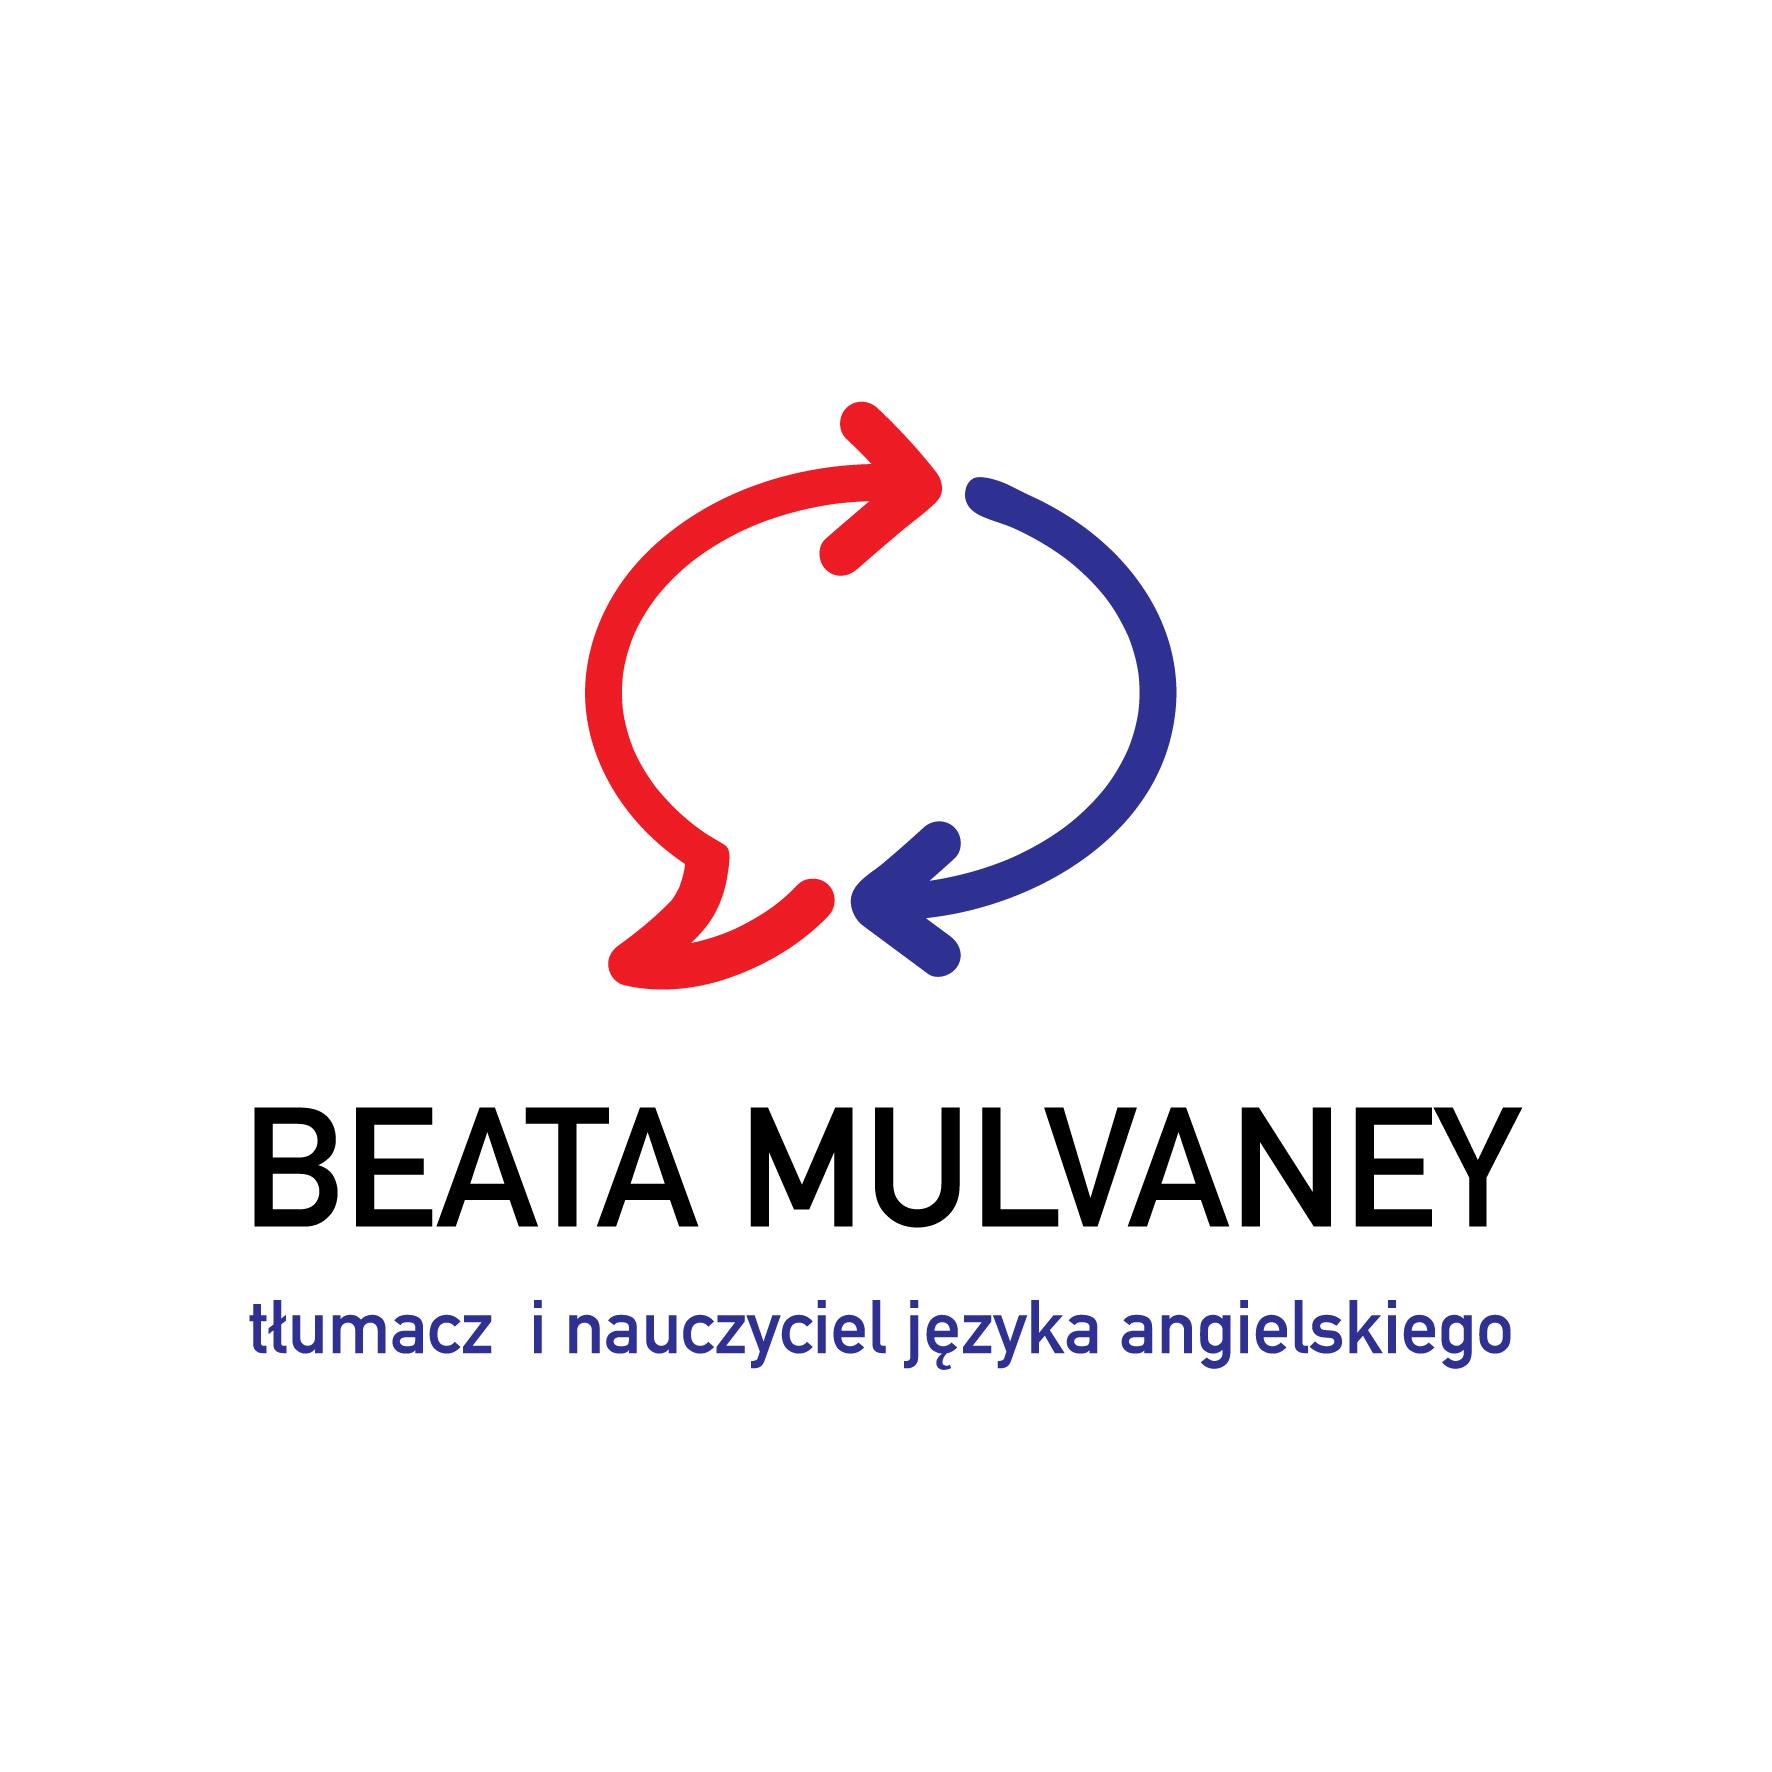 beata mulvaney logo-01.jpg